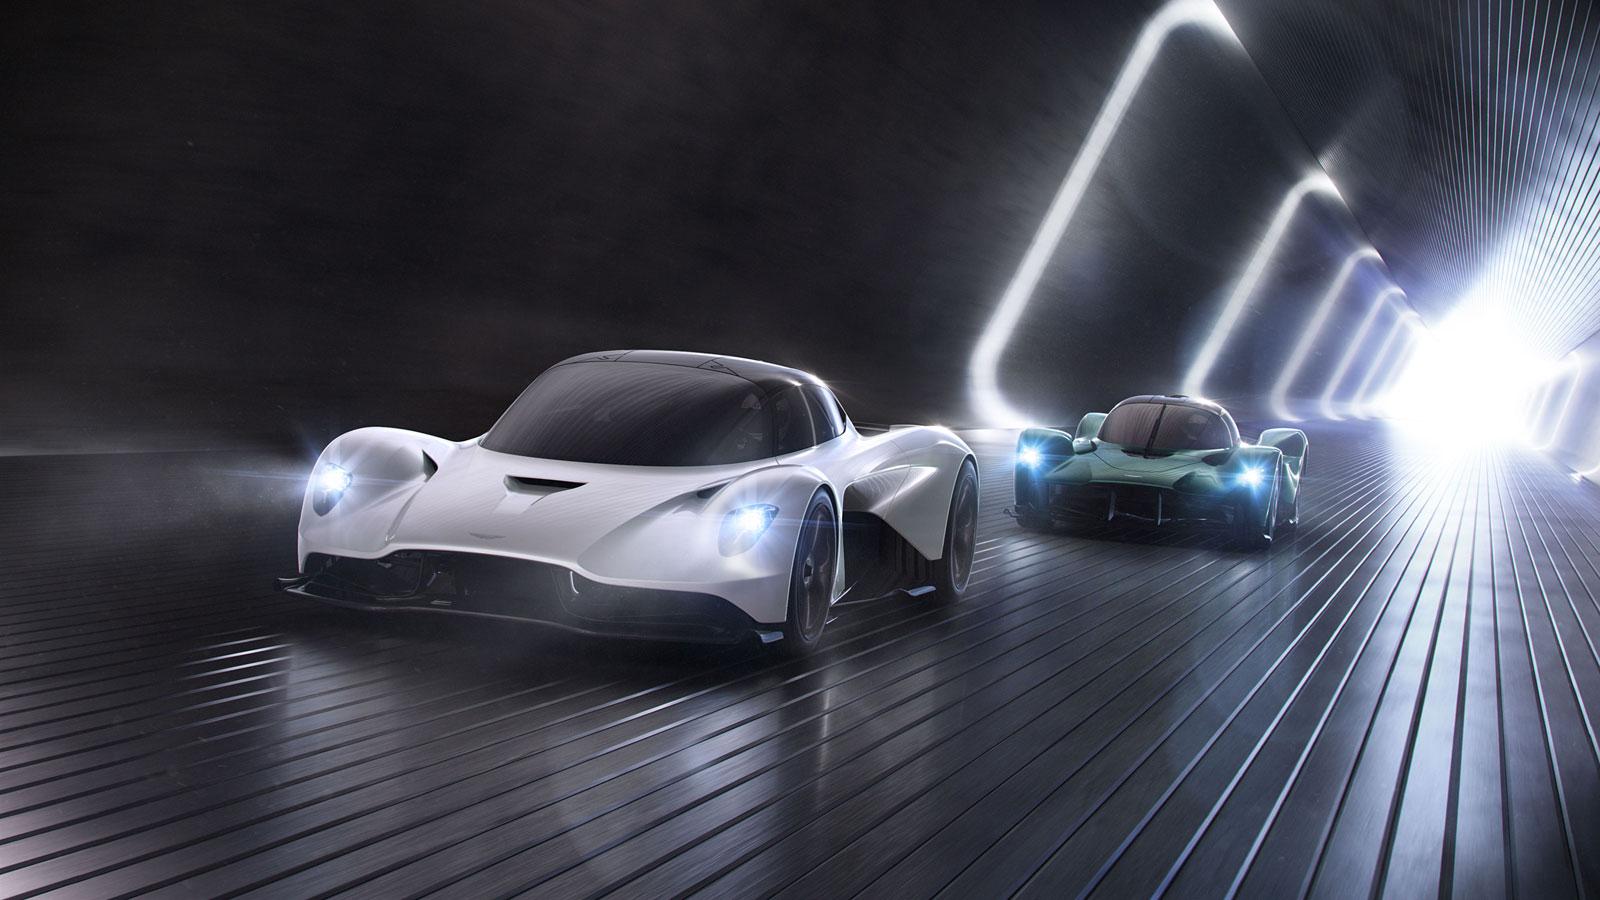 Aston Martin Vanquish Vision Concept Car Body Design